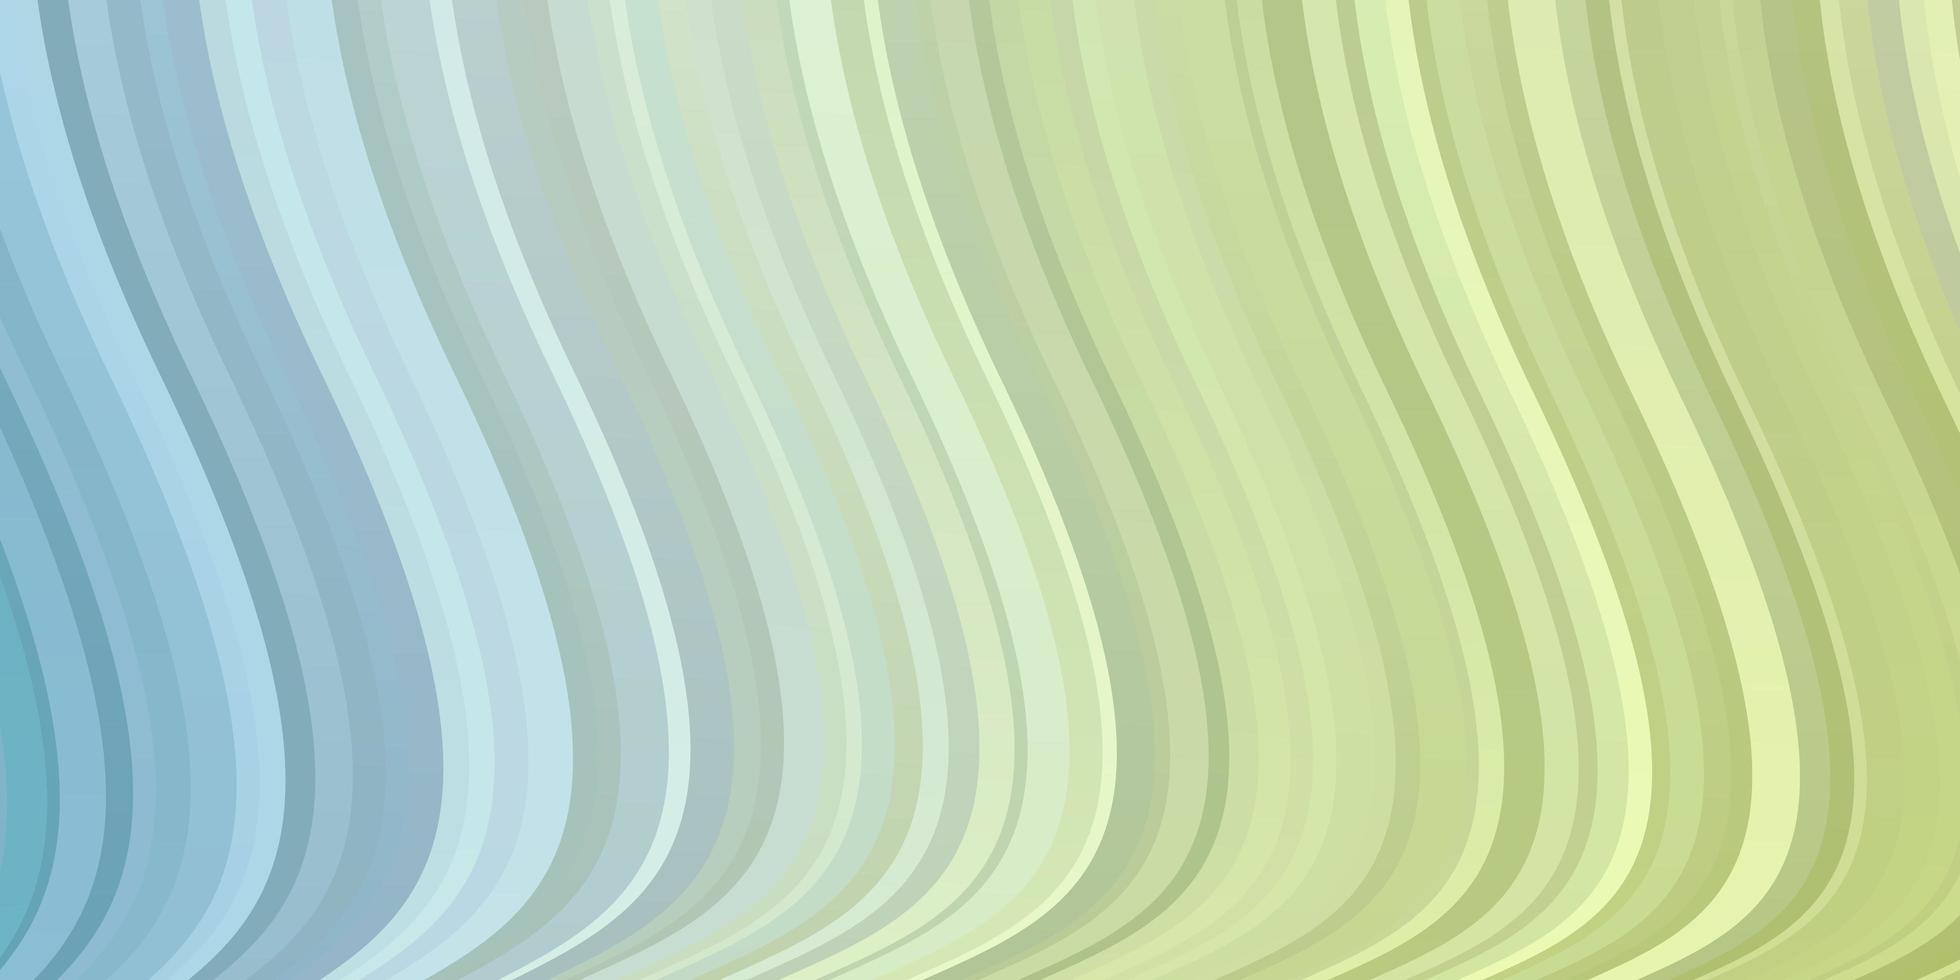 fond de vecteur bleu clair, vert avec des courbes.